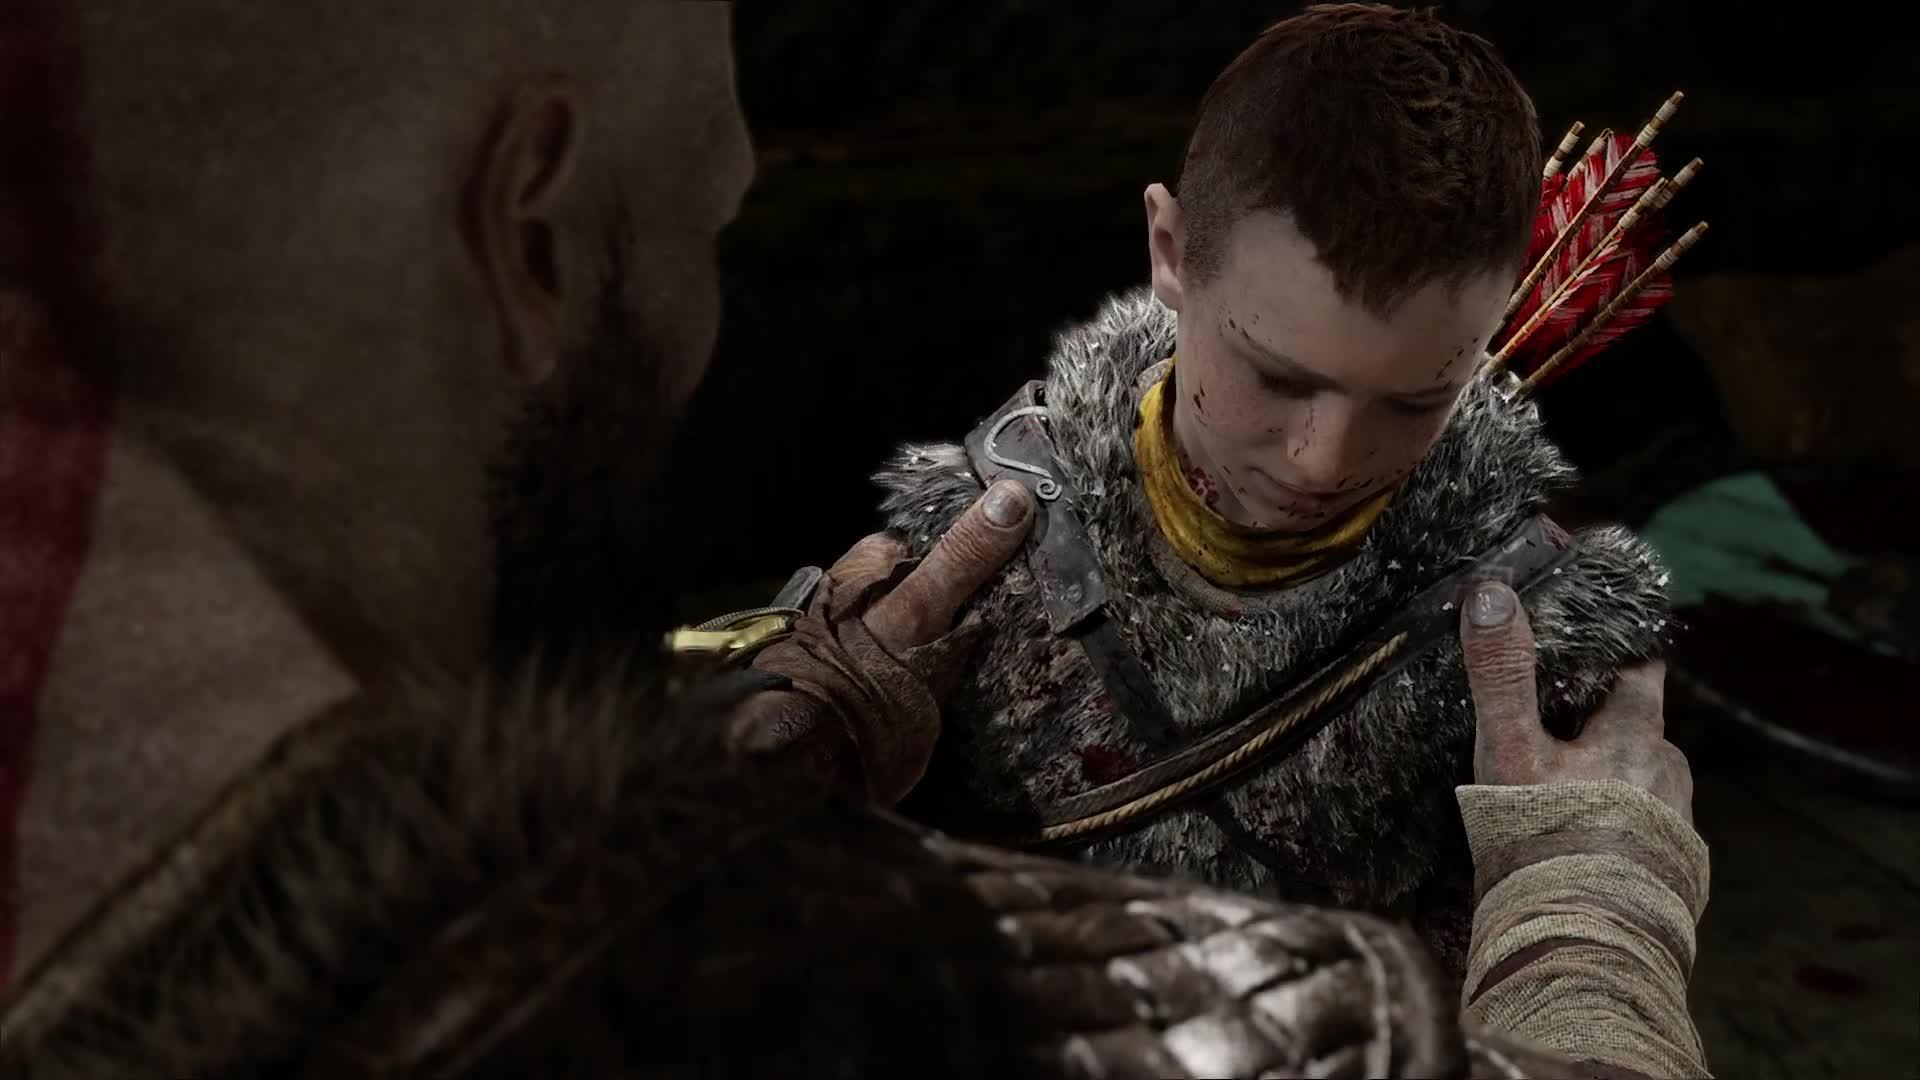 Atreus, Cory Barlog, E3, E3 2017, Gameplay, God of War, Incredible, Kratos, Mythology, Norse, God of War - Bringing Atreus to Life | PS4 GIFs